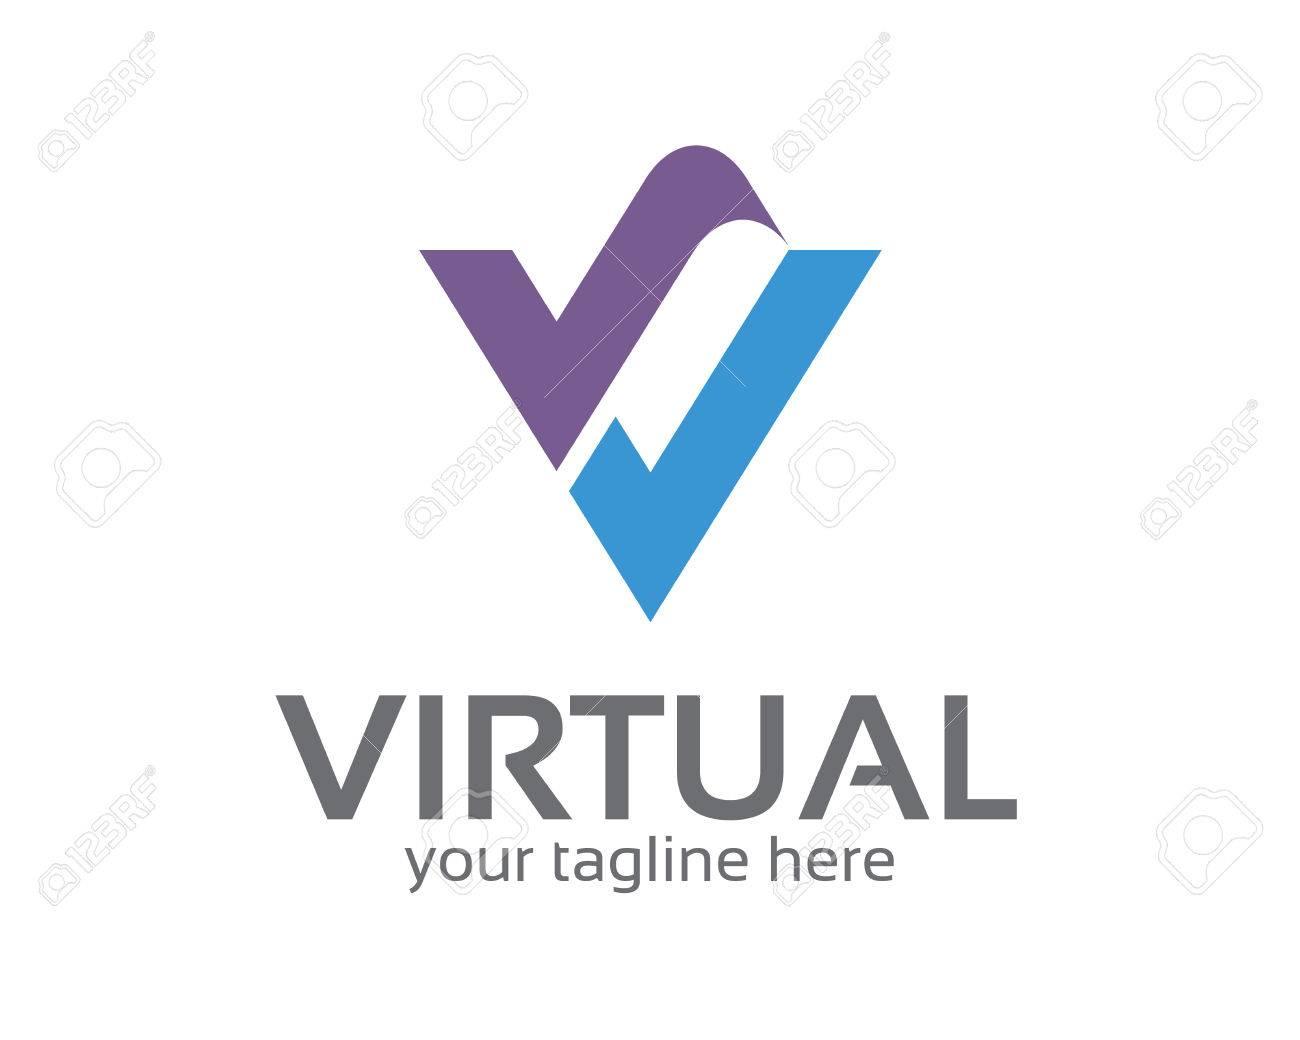 Vector graphic design business logo - Business Corporate Letter V Logo Design Template Simple And Clean Flat Design Of Letter V